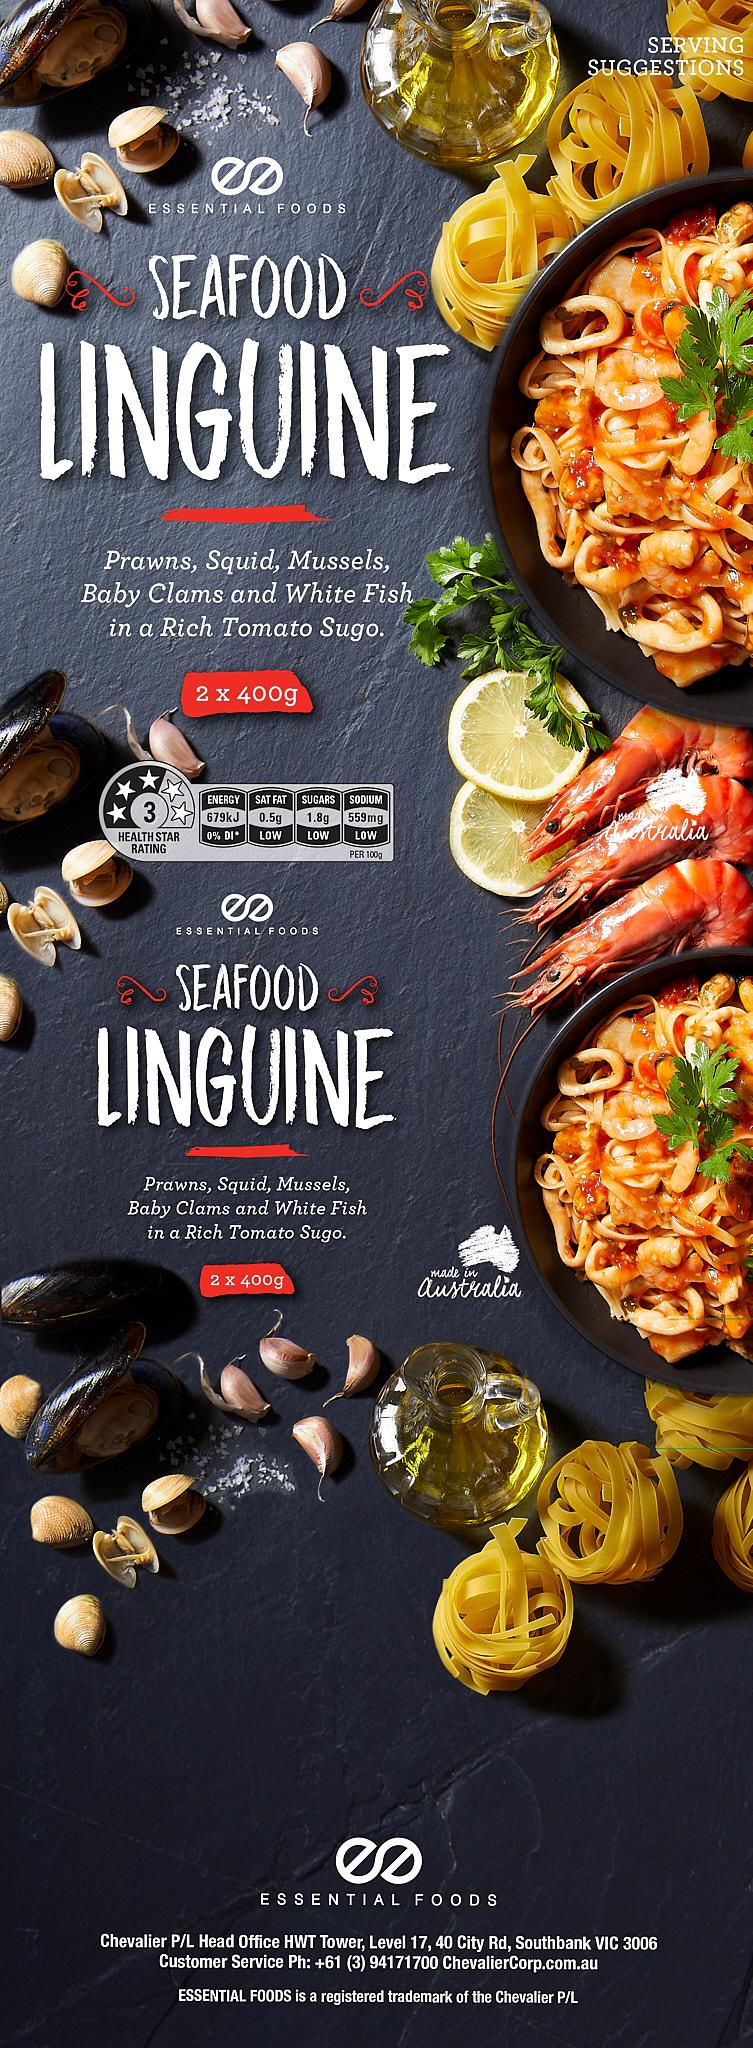 Essential Foods Seafood Linguine pack